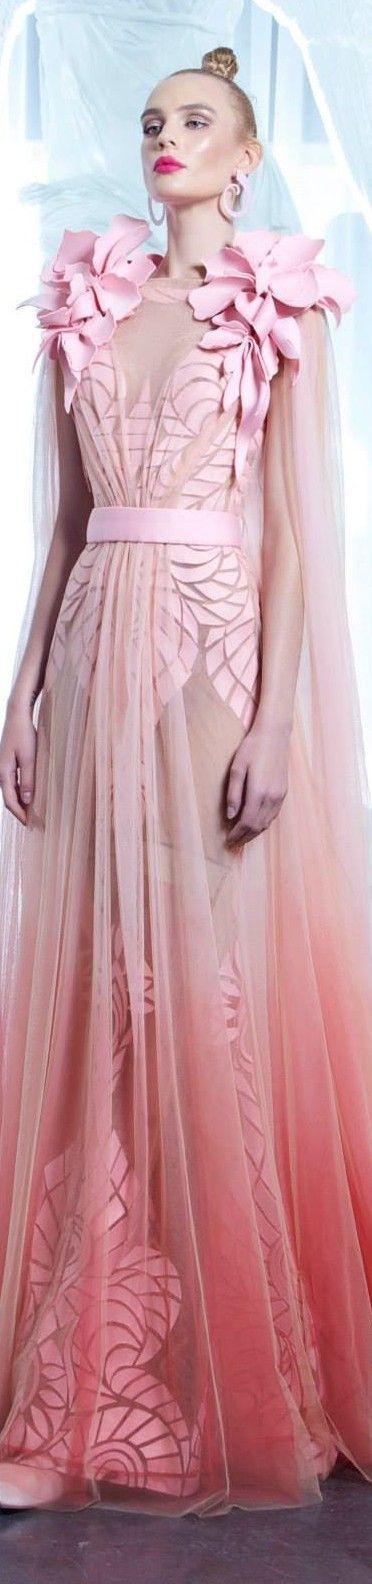 Nicolas Jebran couture 2015   Vestidos   Pinterest   Alta costura ...